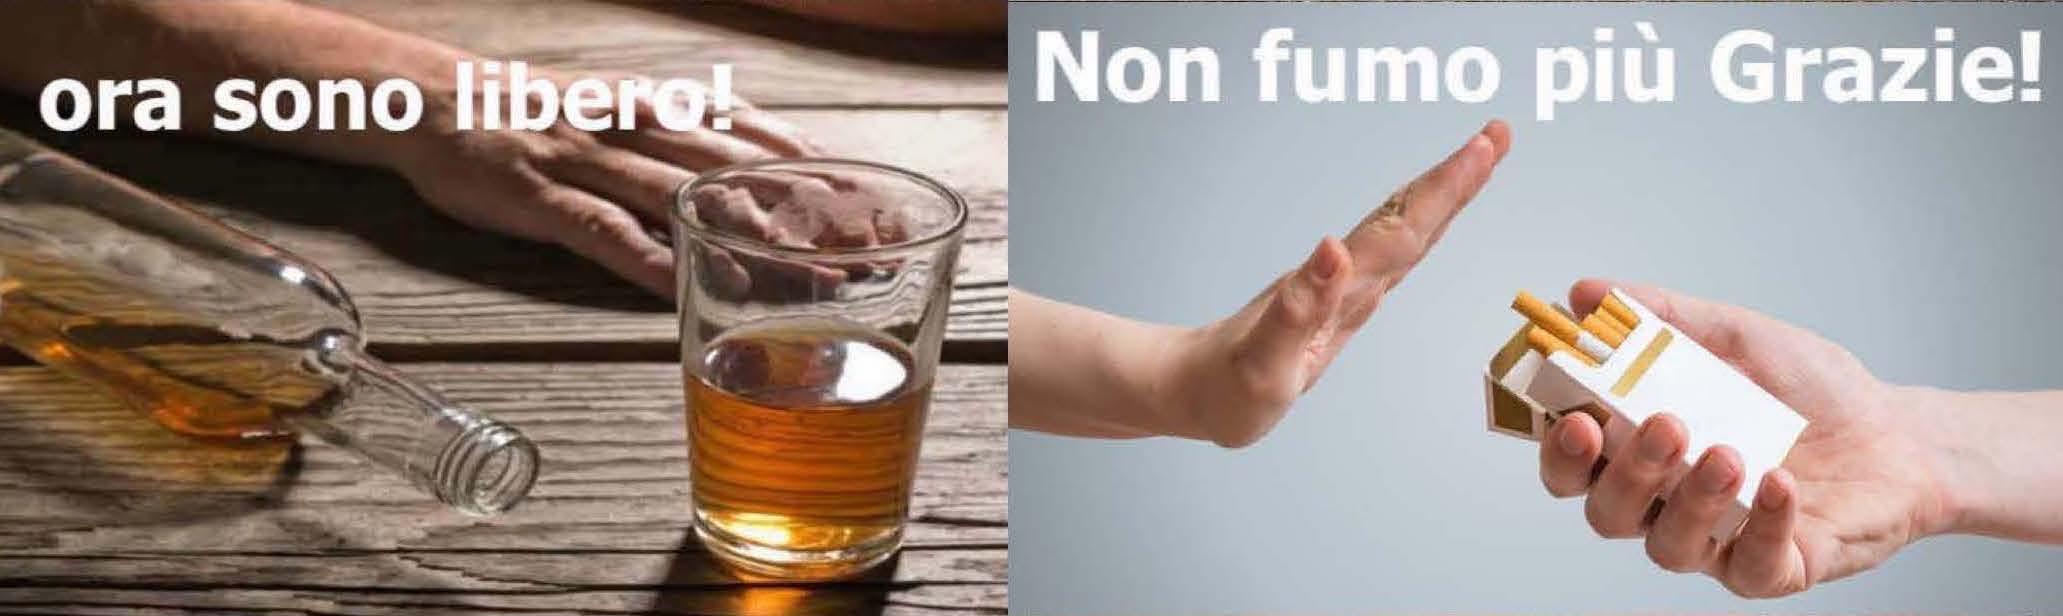 2 FOTO NO FUMO E ALCOL TDGjpeg